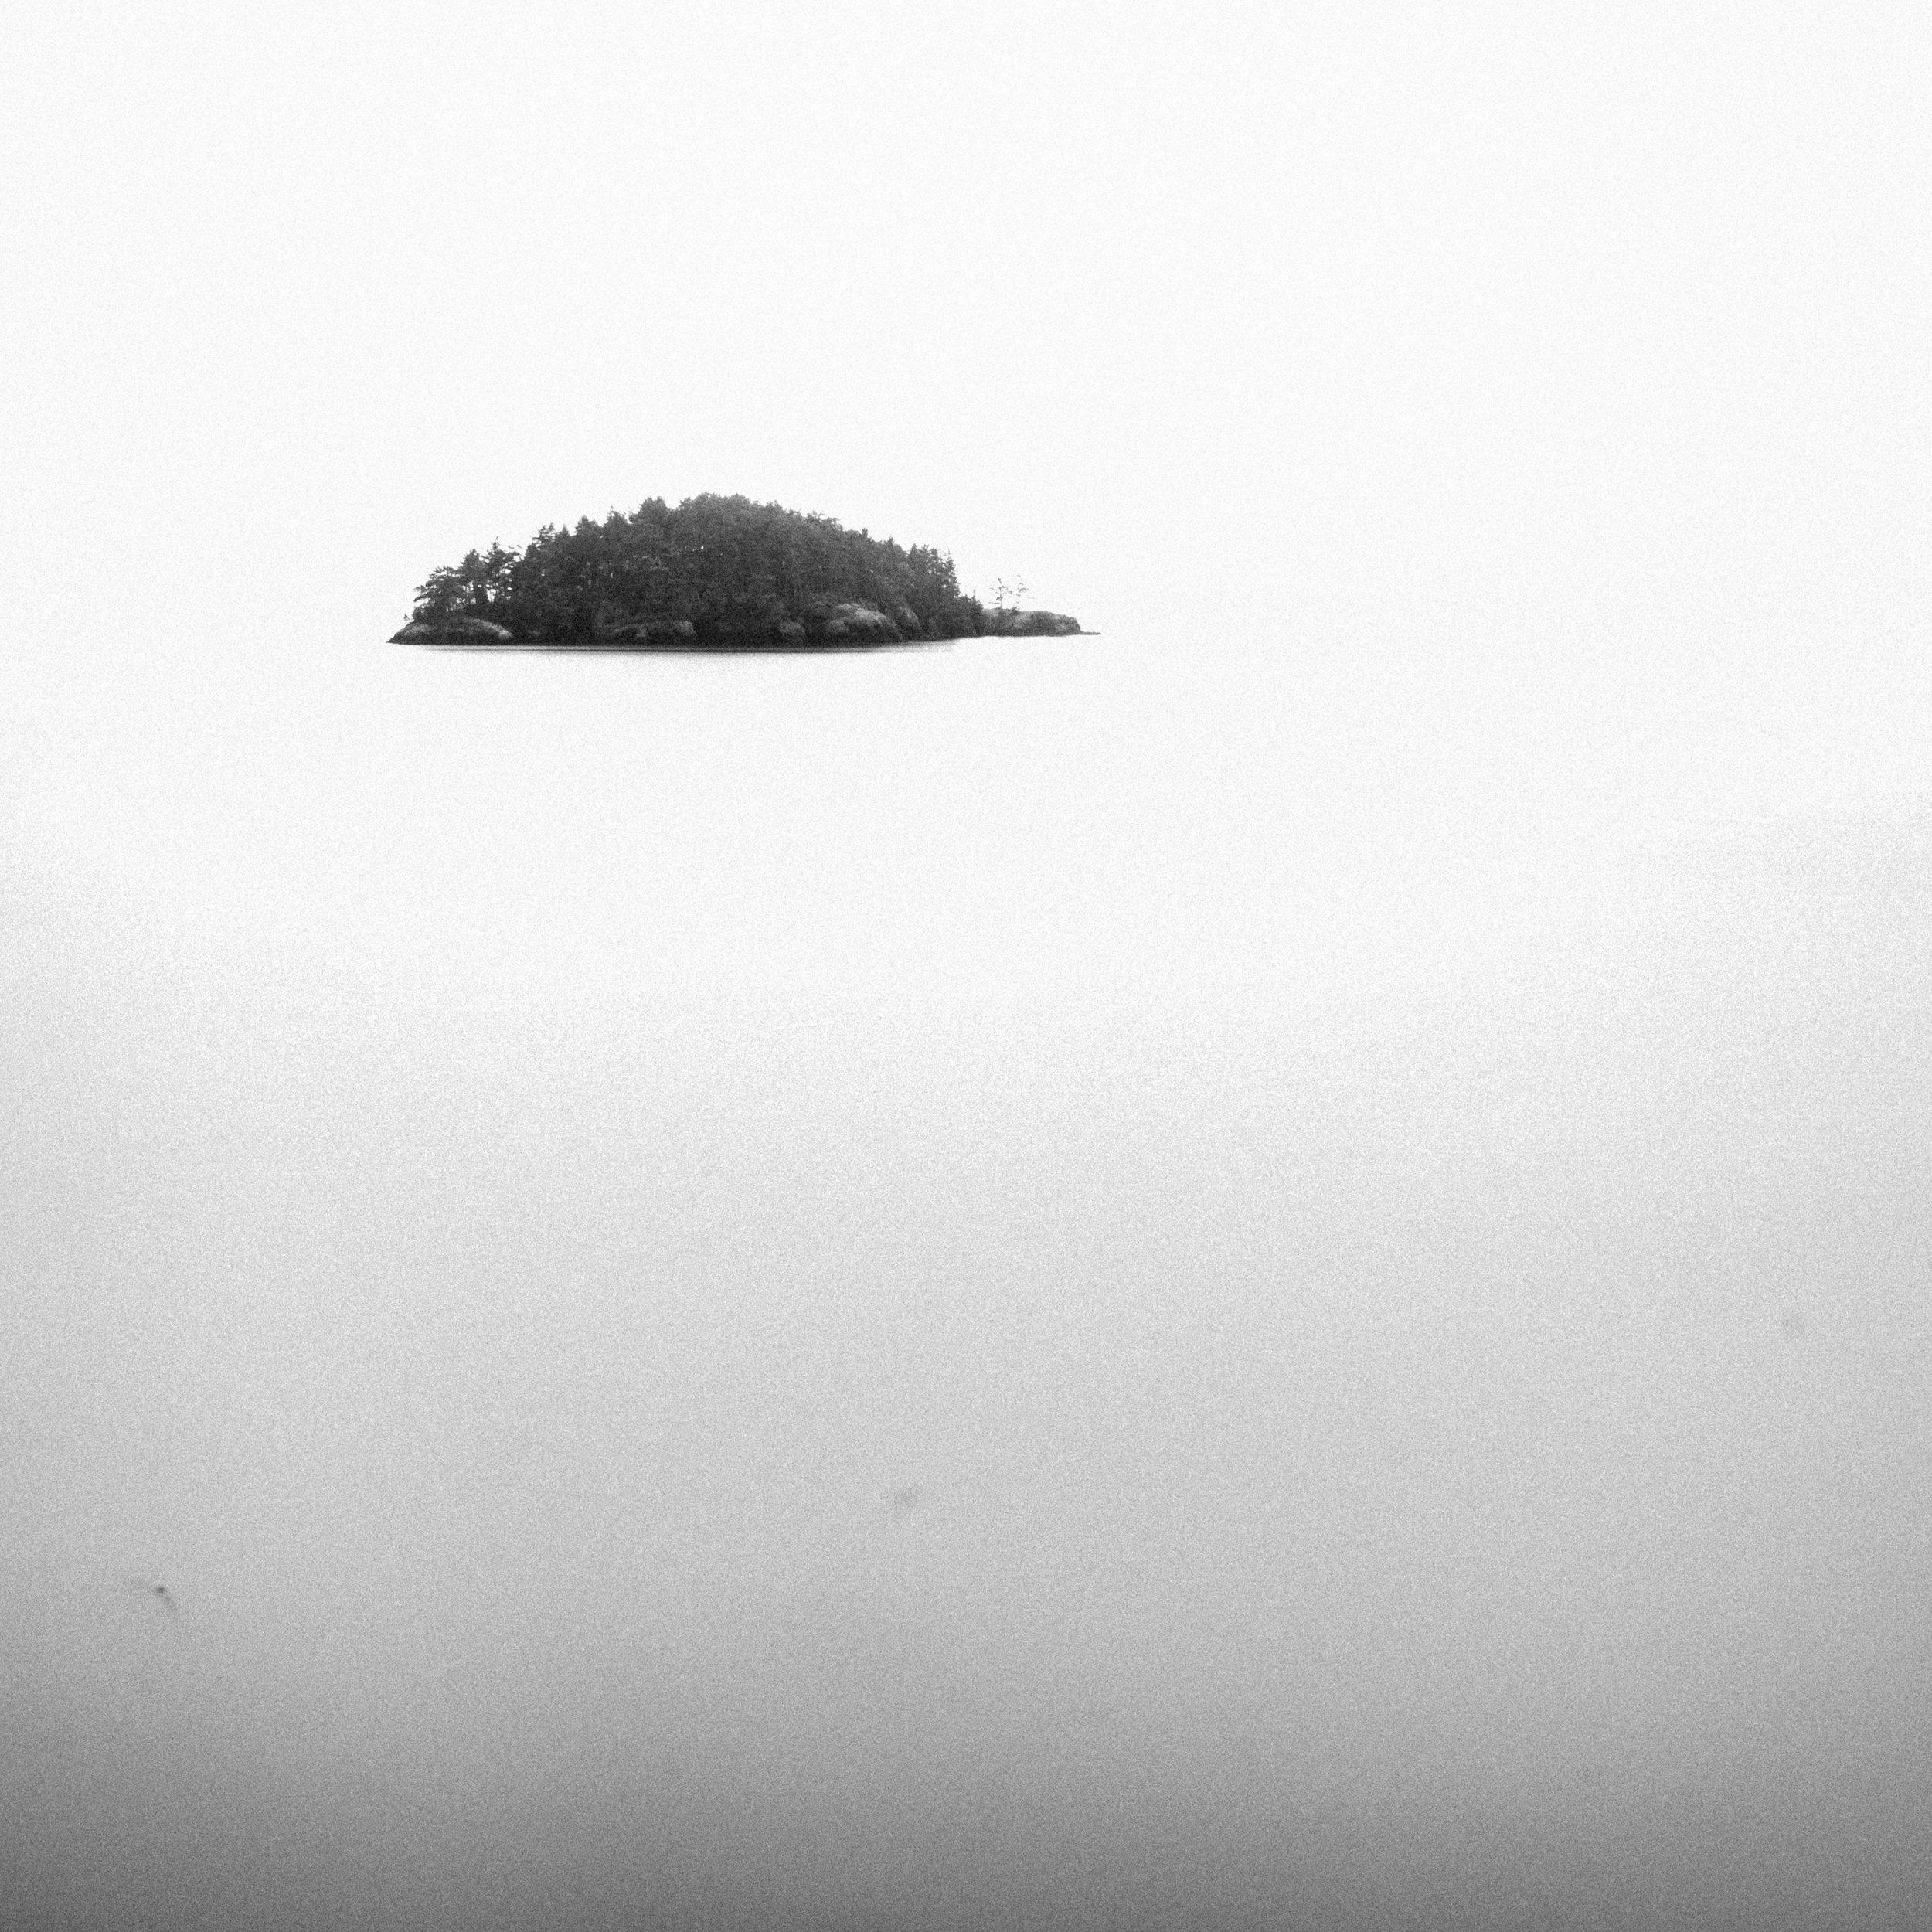 Deception Island, May 2017